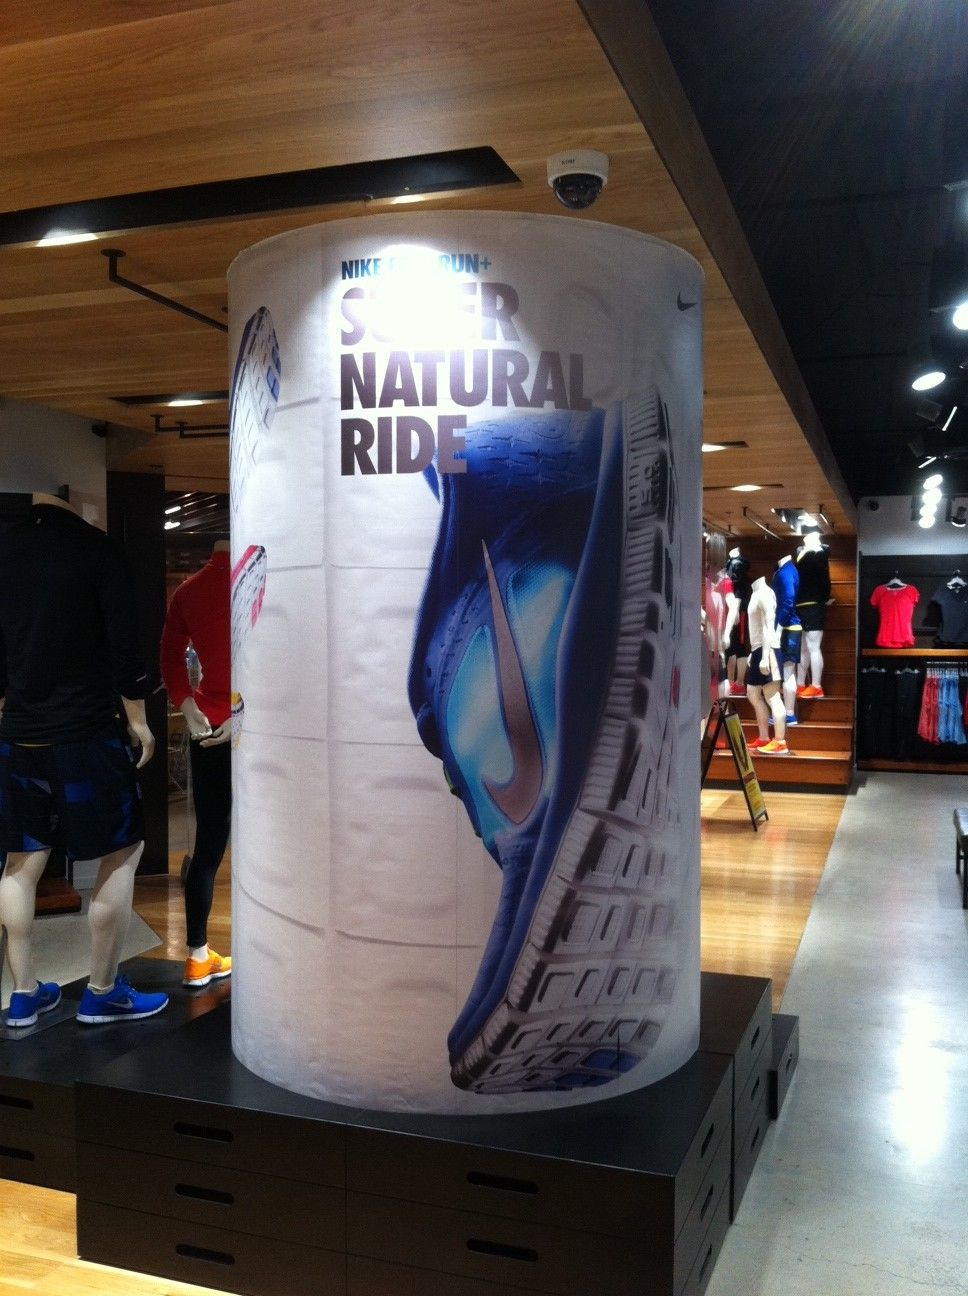 Pitt Display Nike Retail Street Shoe Ride Super Column Wrap Natural 7tqtgw